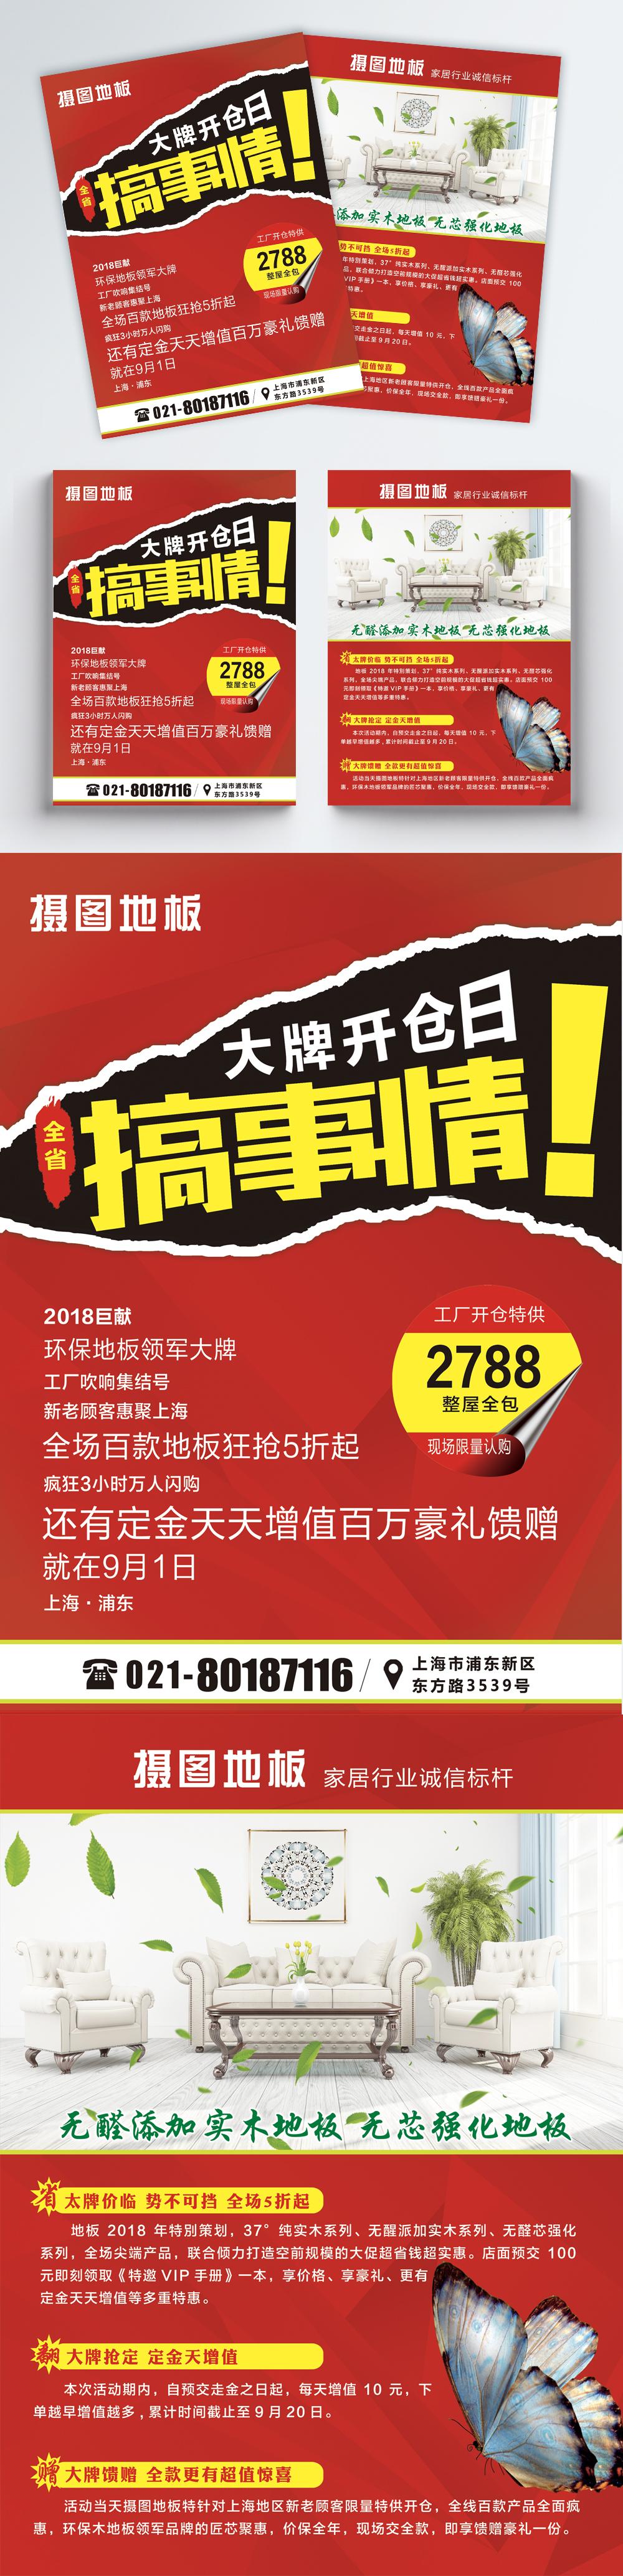 Leaflet Promosi Bahan Bangunan Rumah Gambar Unduh Gratis Templat 400395001 Format Gambar Psd Lovepik Com